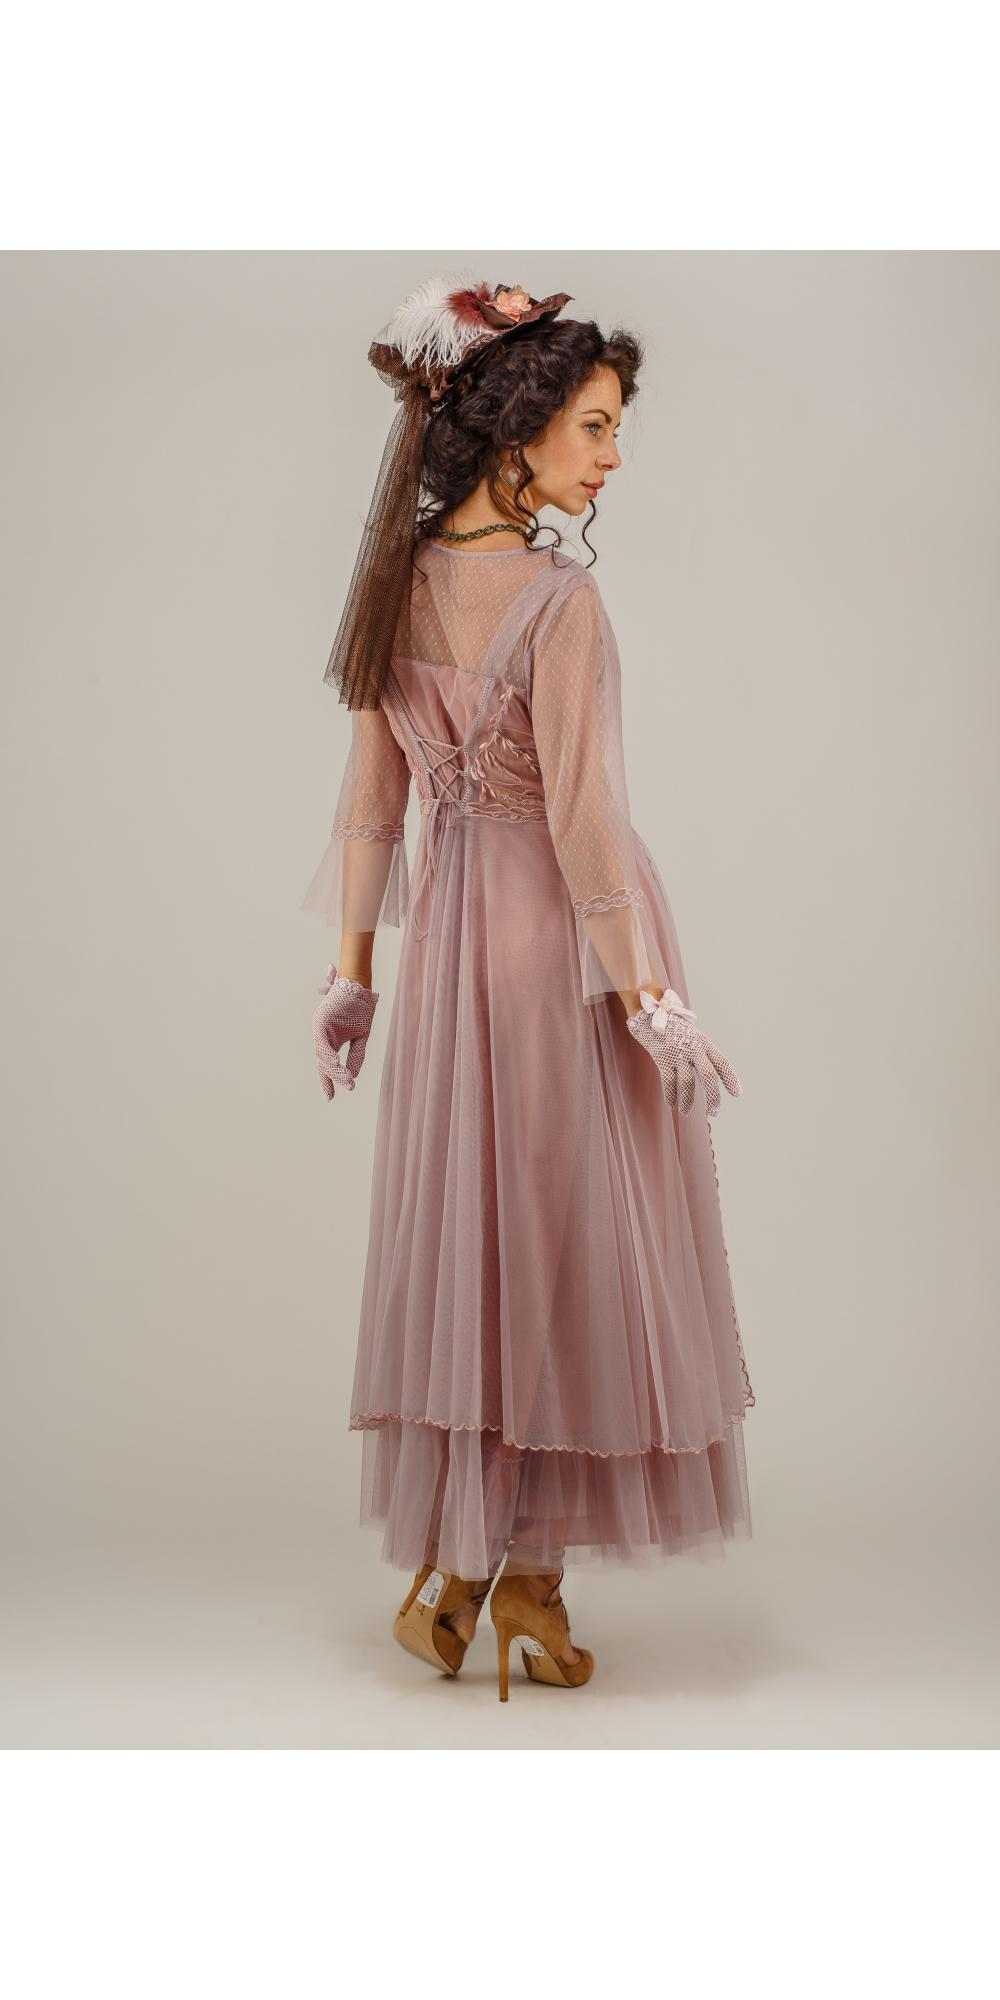 True Romance Nataya Cl 075 Vintage Style Wedding Dress In Mauve